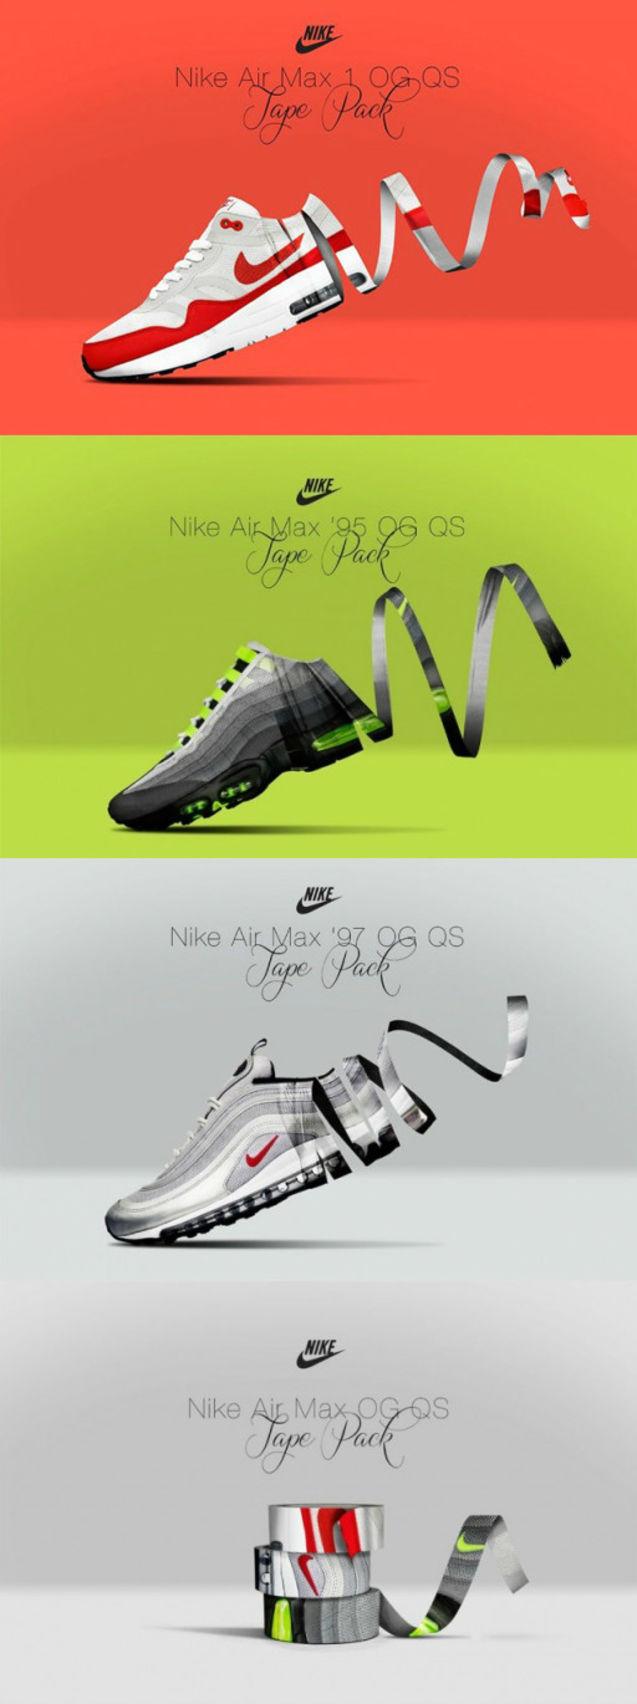 创意 max/Nike Air Max系列创意广告,胶带缠绕成了Air Max 1、Air Max 95...